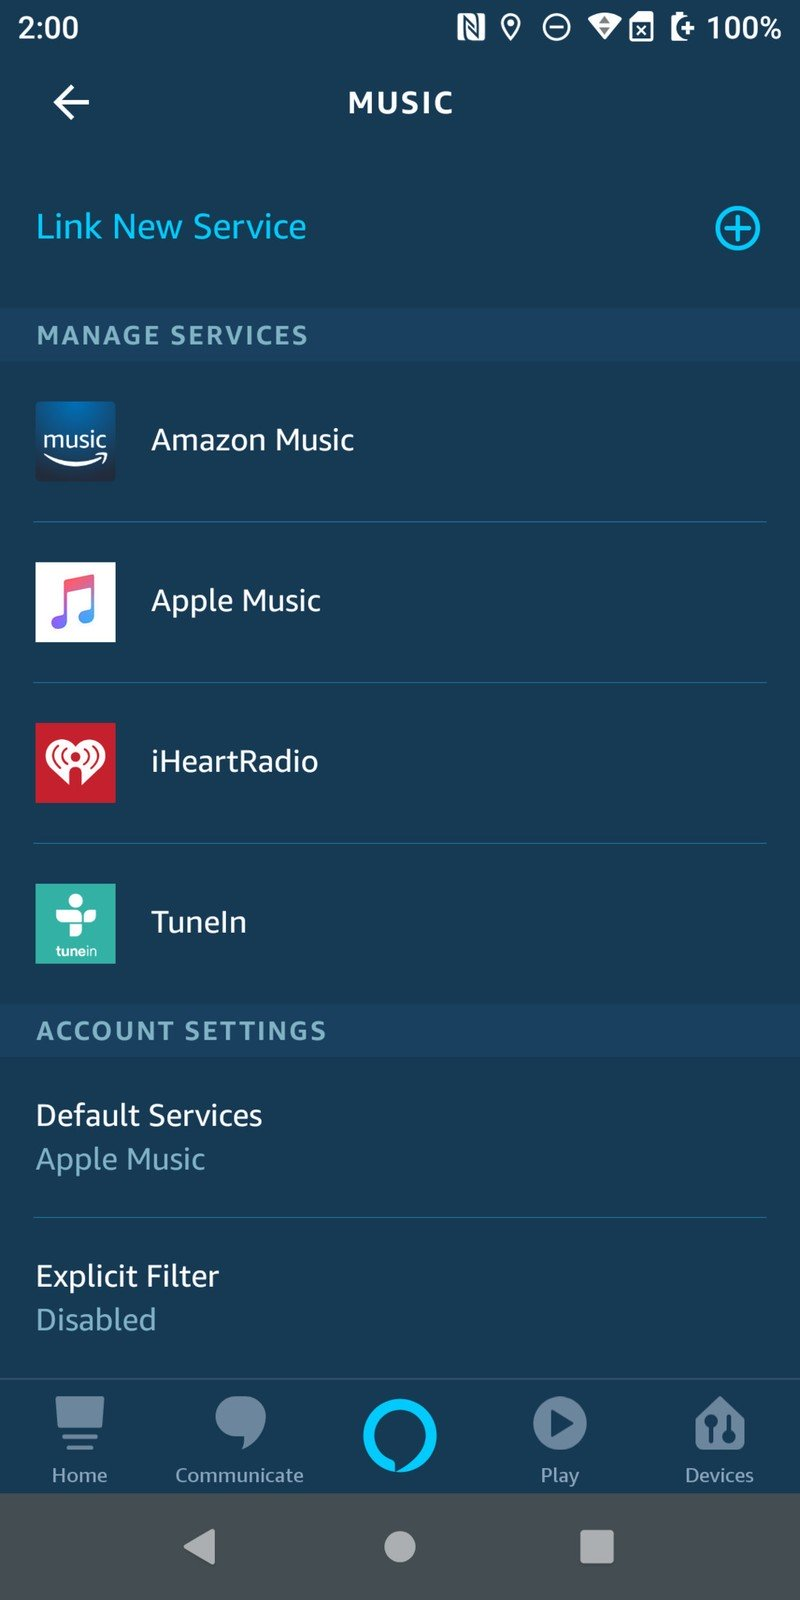 alexa-app-music-default-2.jpg?itok=sux68